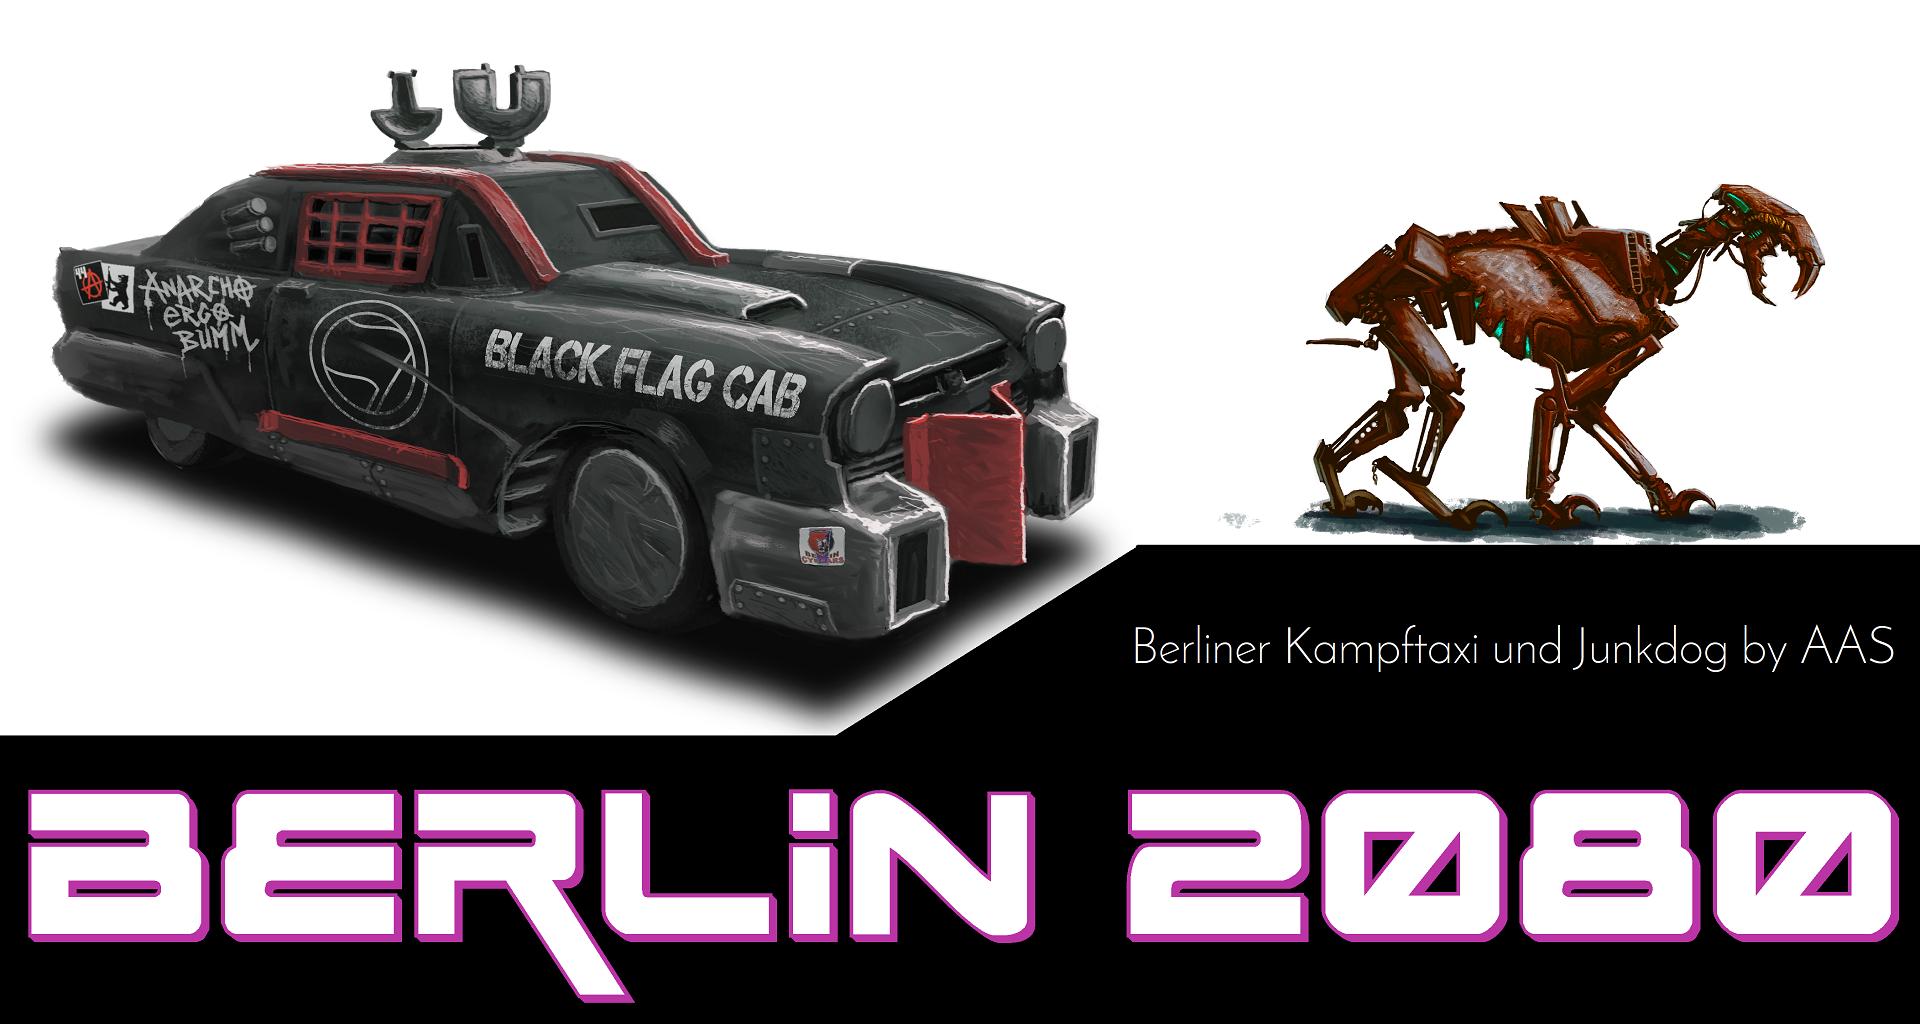 berlin-2080-kampftaxi-junkdog-art-promo.